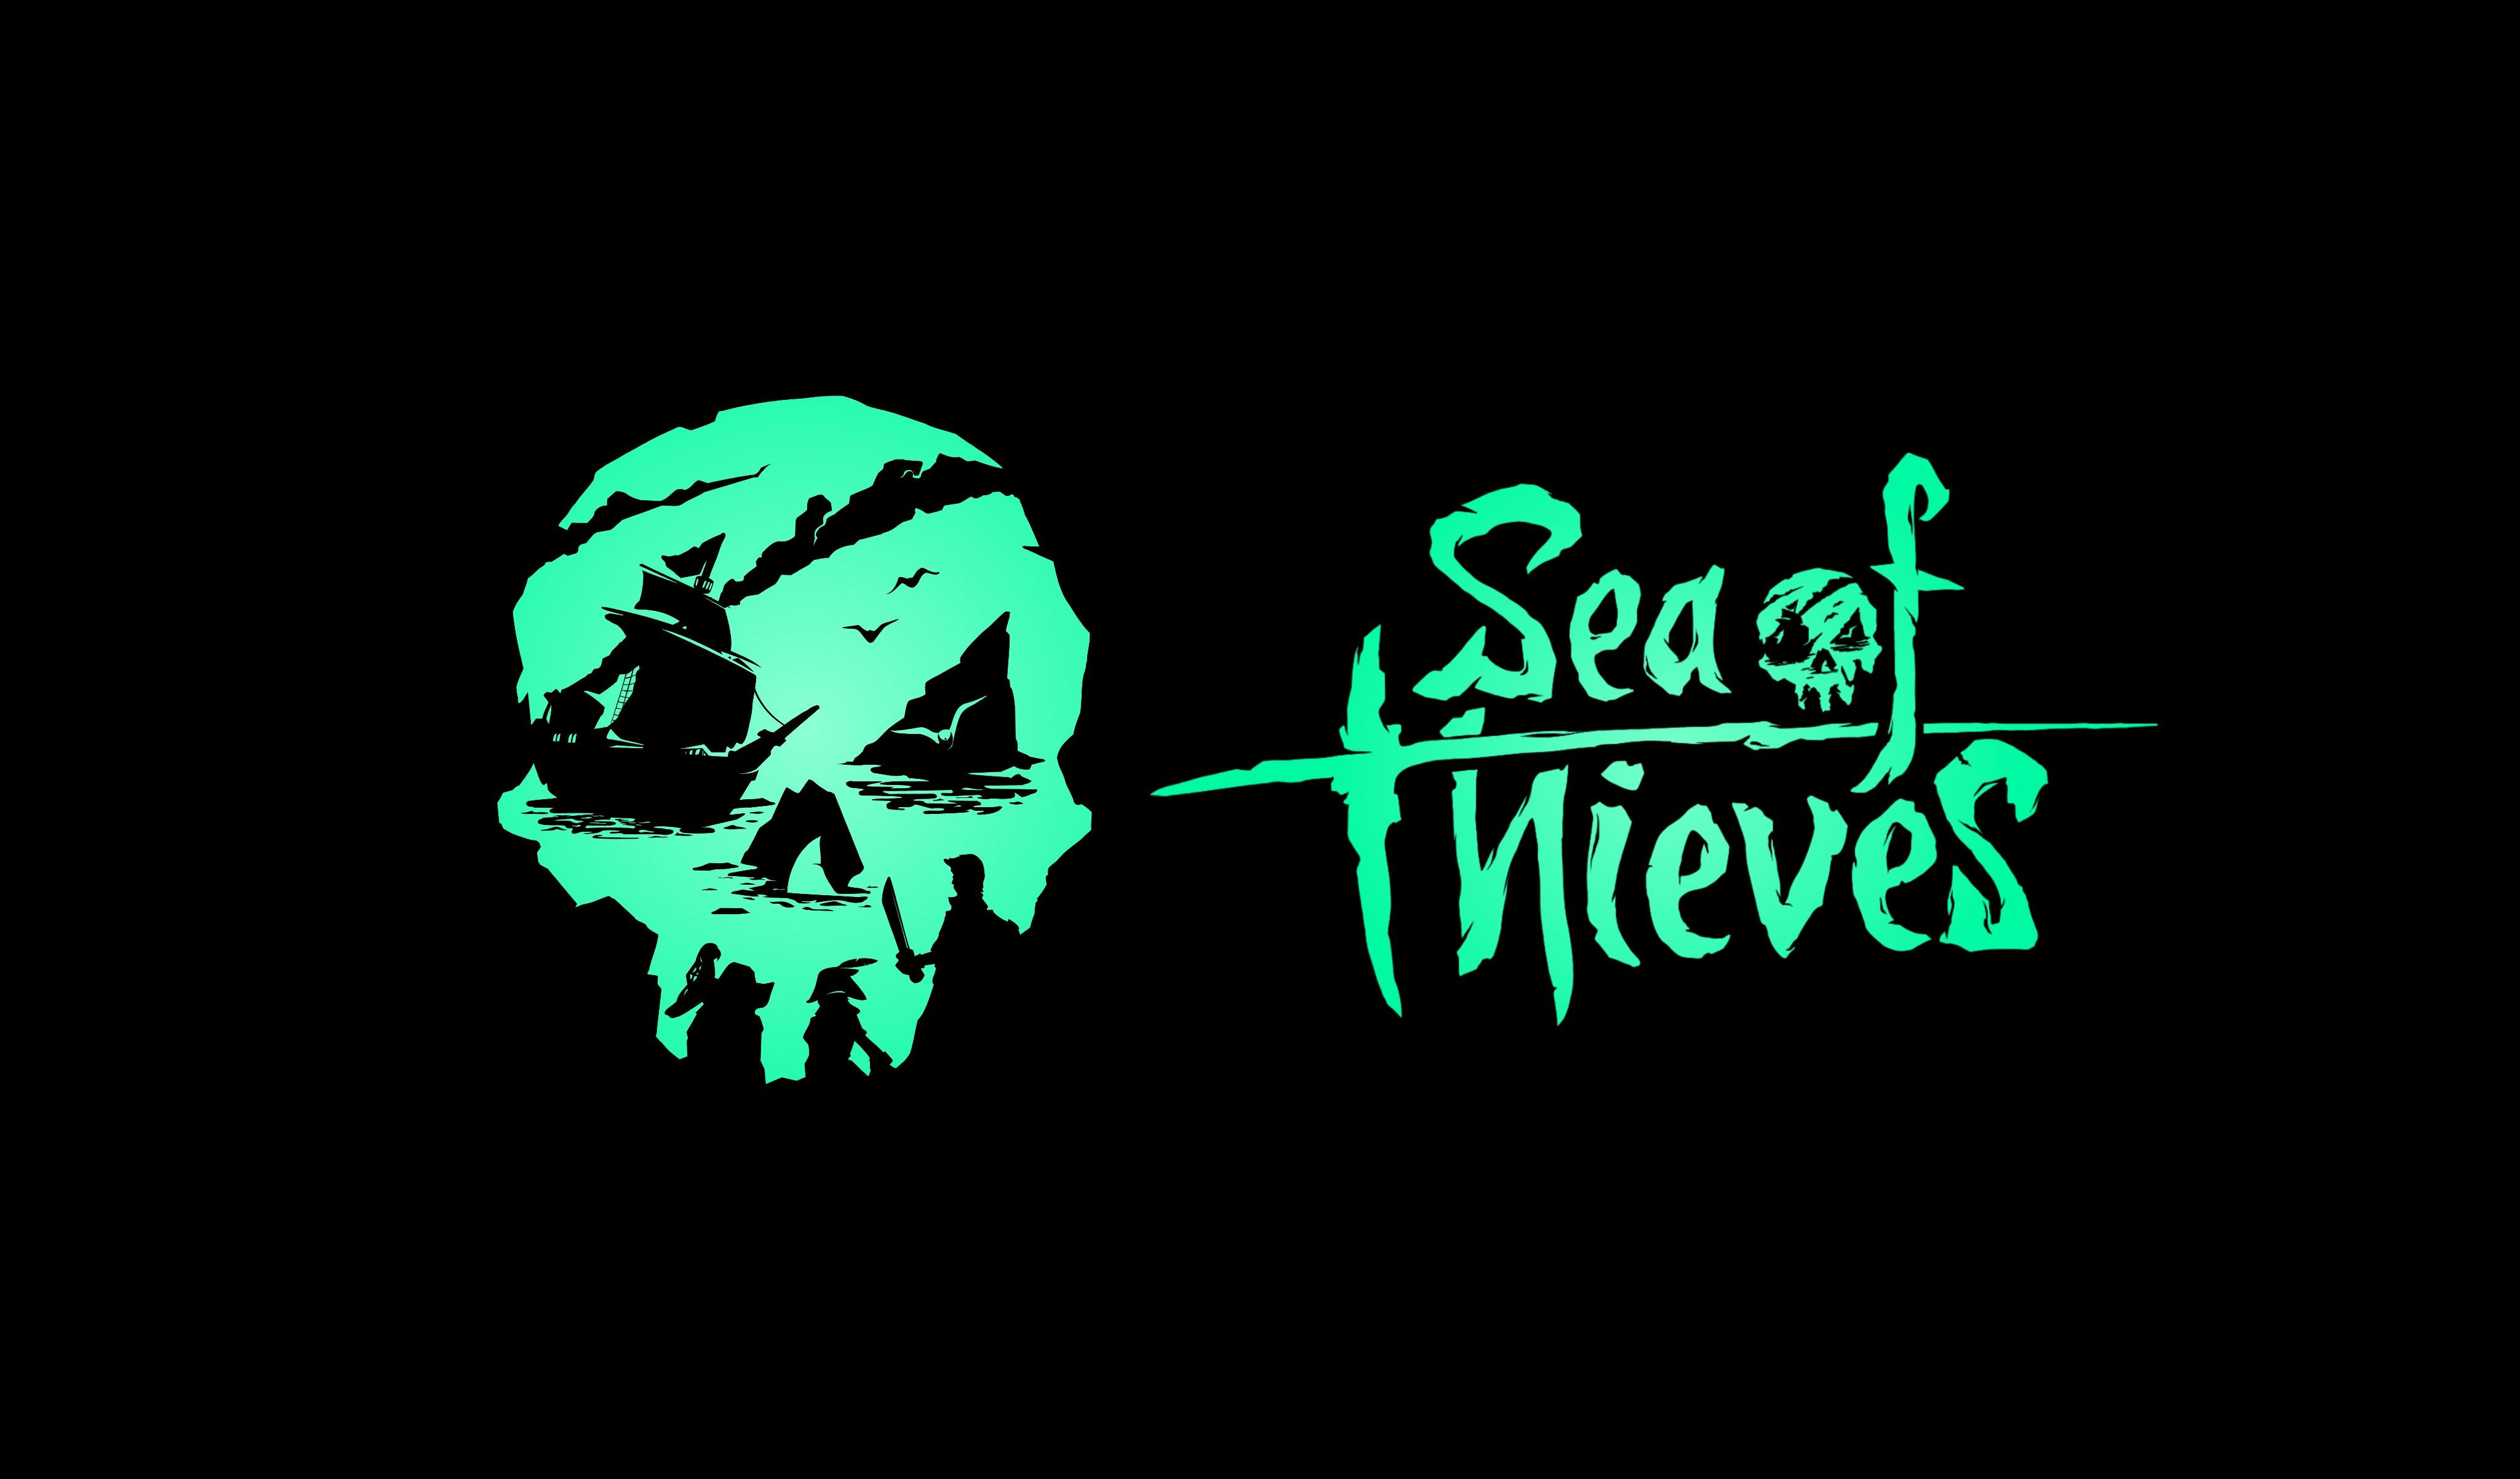 Wallpaper Sea Of Thieves Pc Gaming Gamers Black Background Skull Mask Logotype 4096x2404 Caminoymaite 1888539 Hd Wallpapers Wallhere